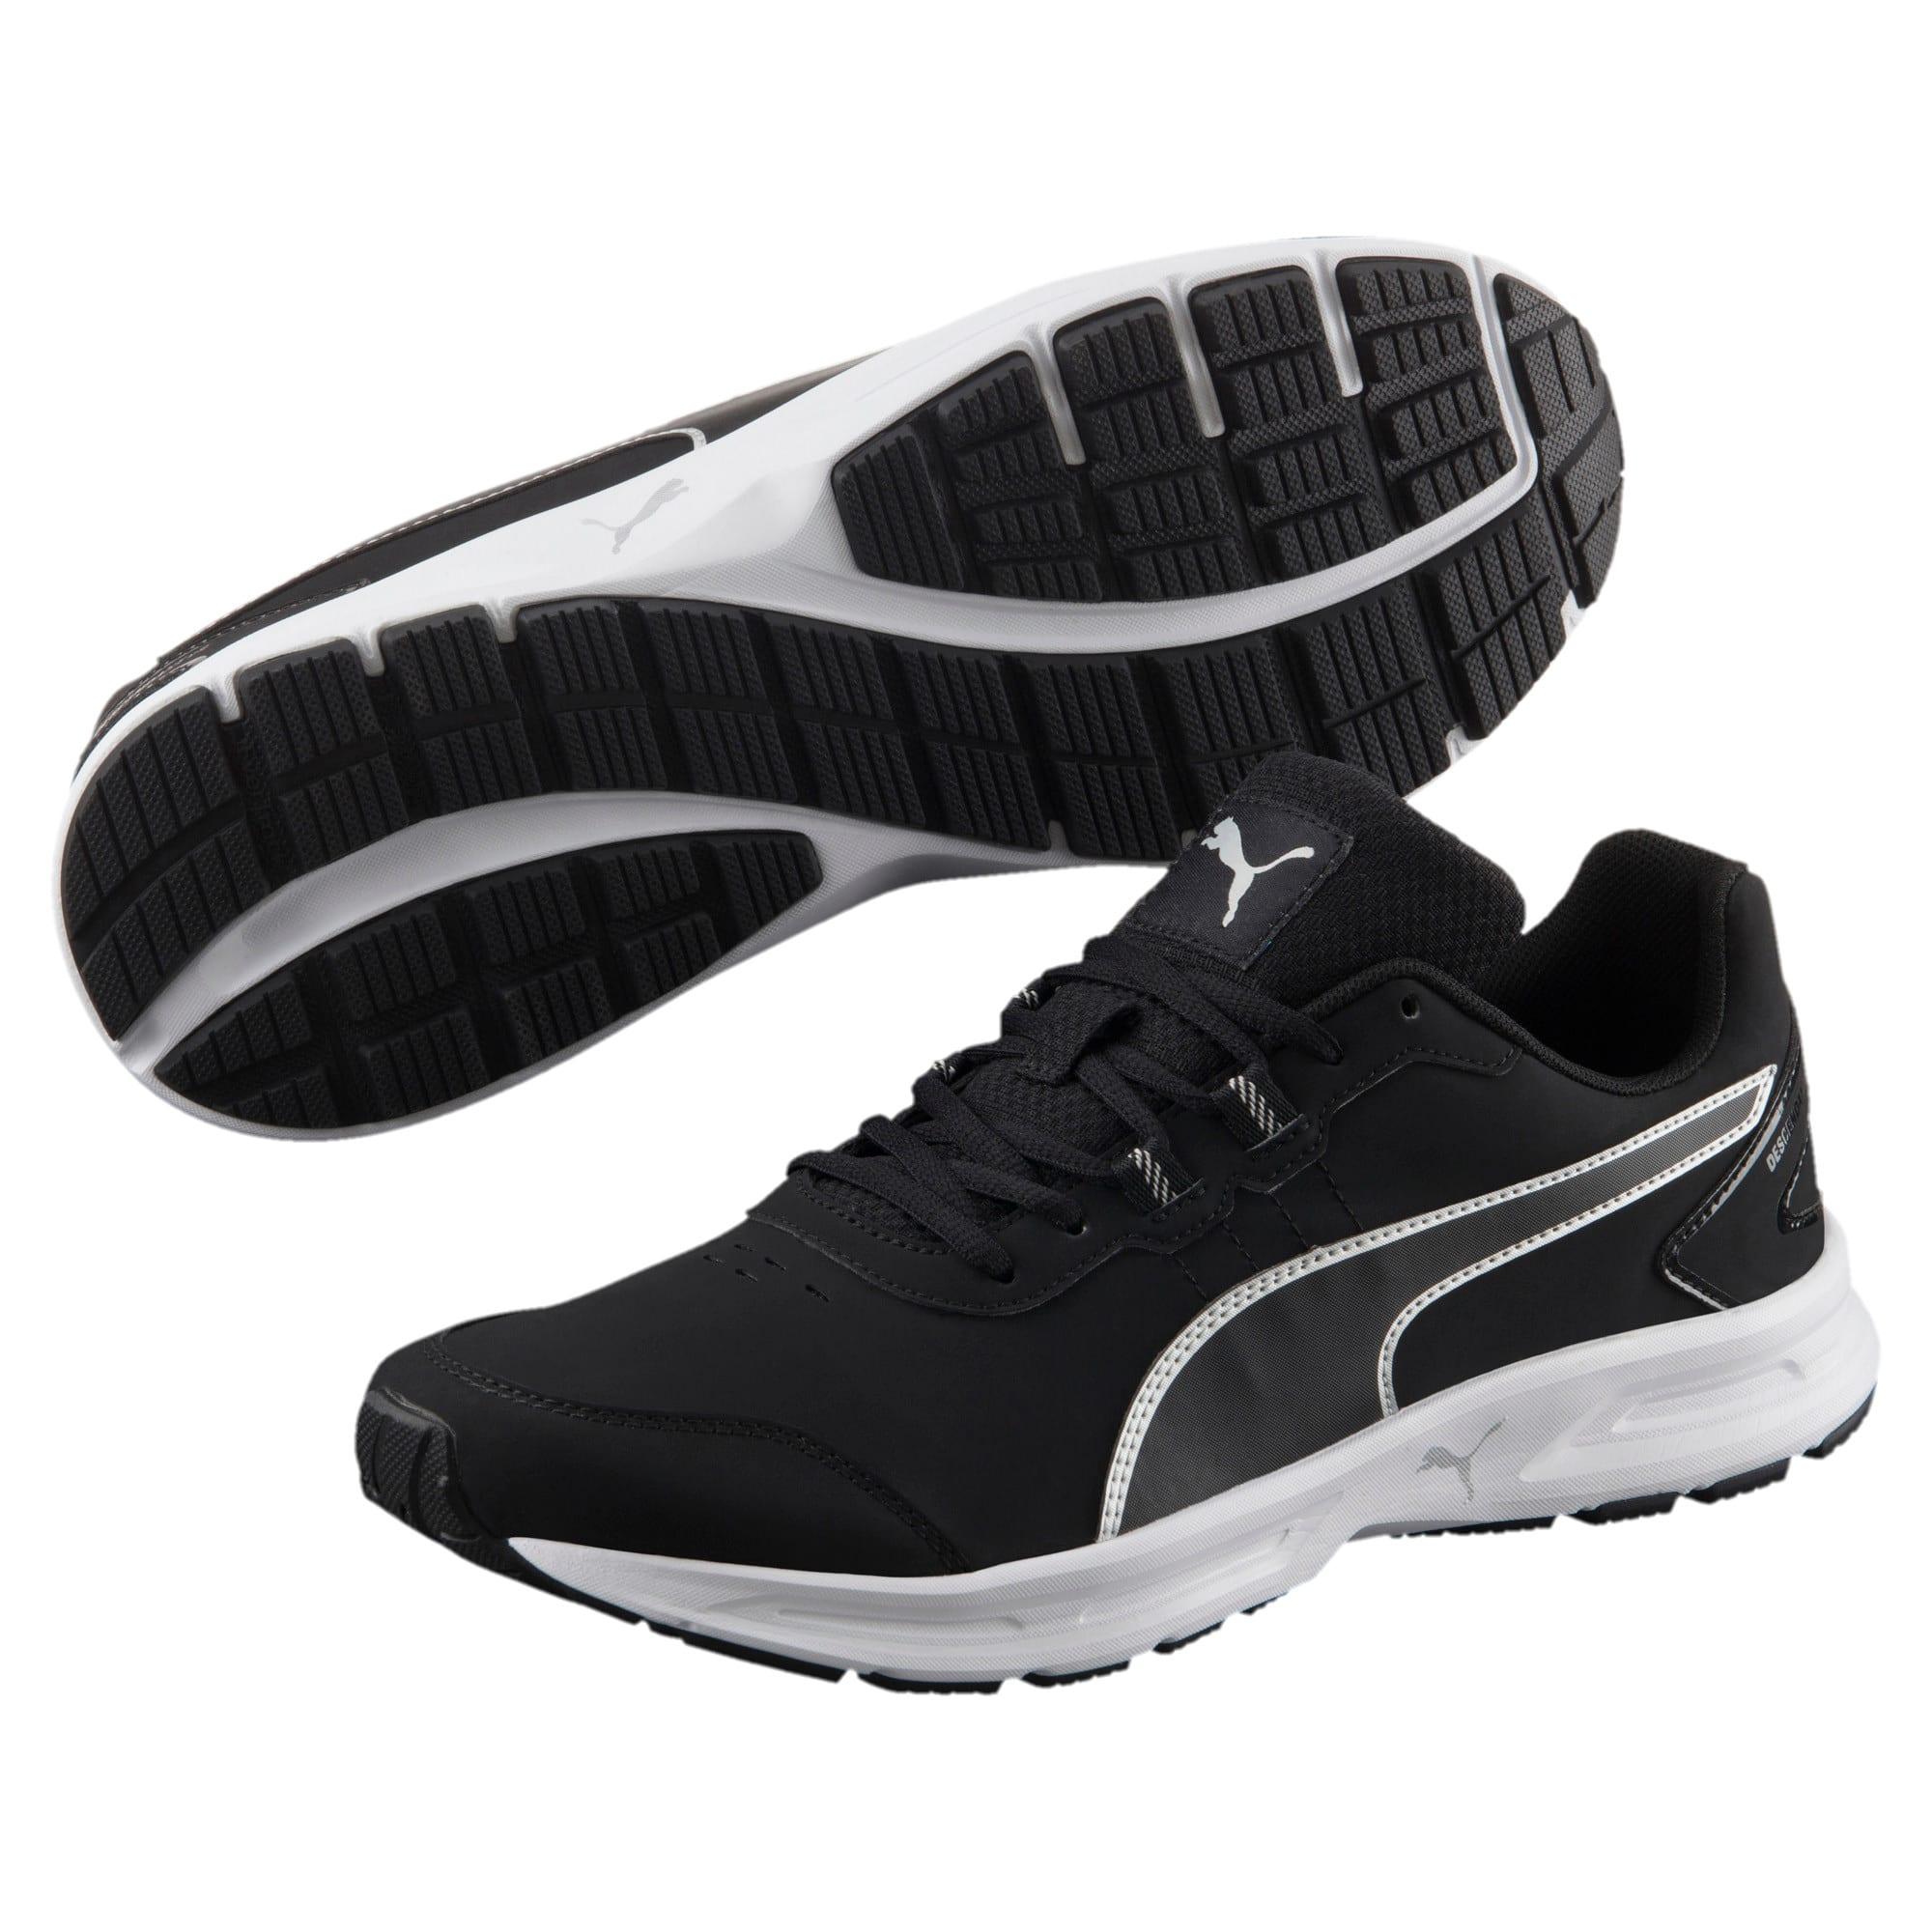 Thumbnail 2 of Descendant v4 SL Running Shoes, Puma Black-Puma Silver, medium-IND